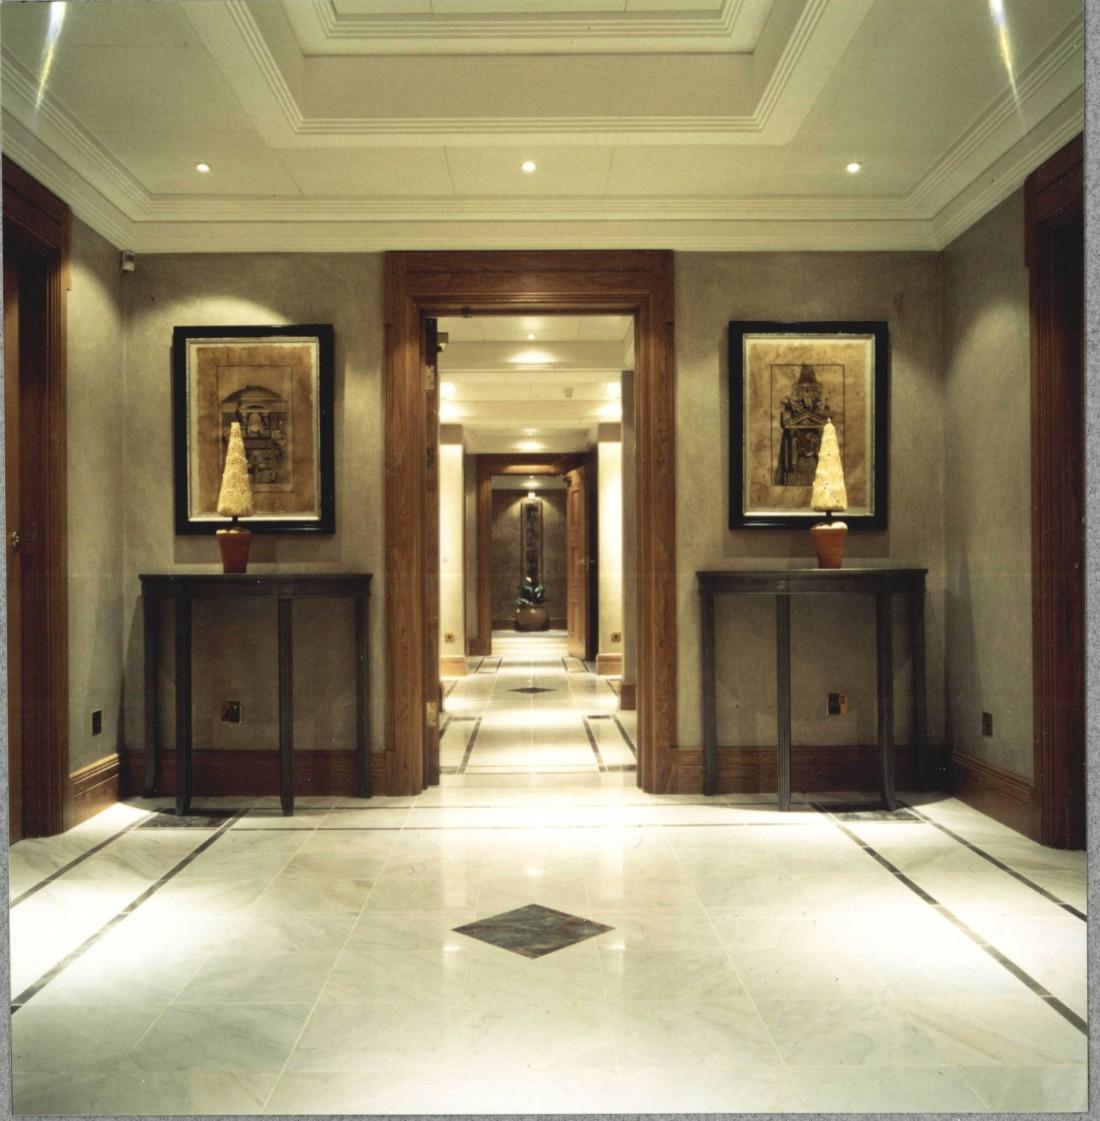 Regents Park Apartments: Esmond Murray Architects